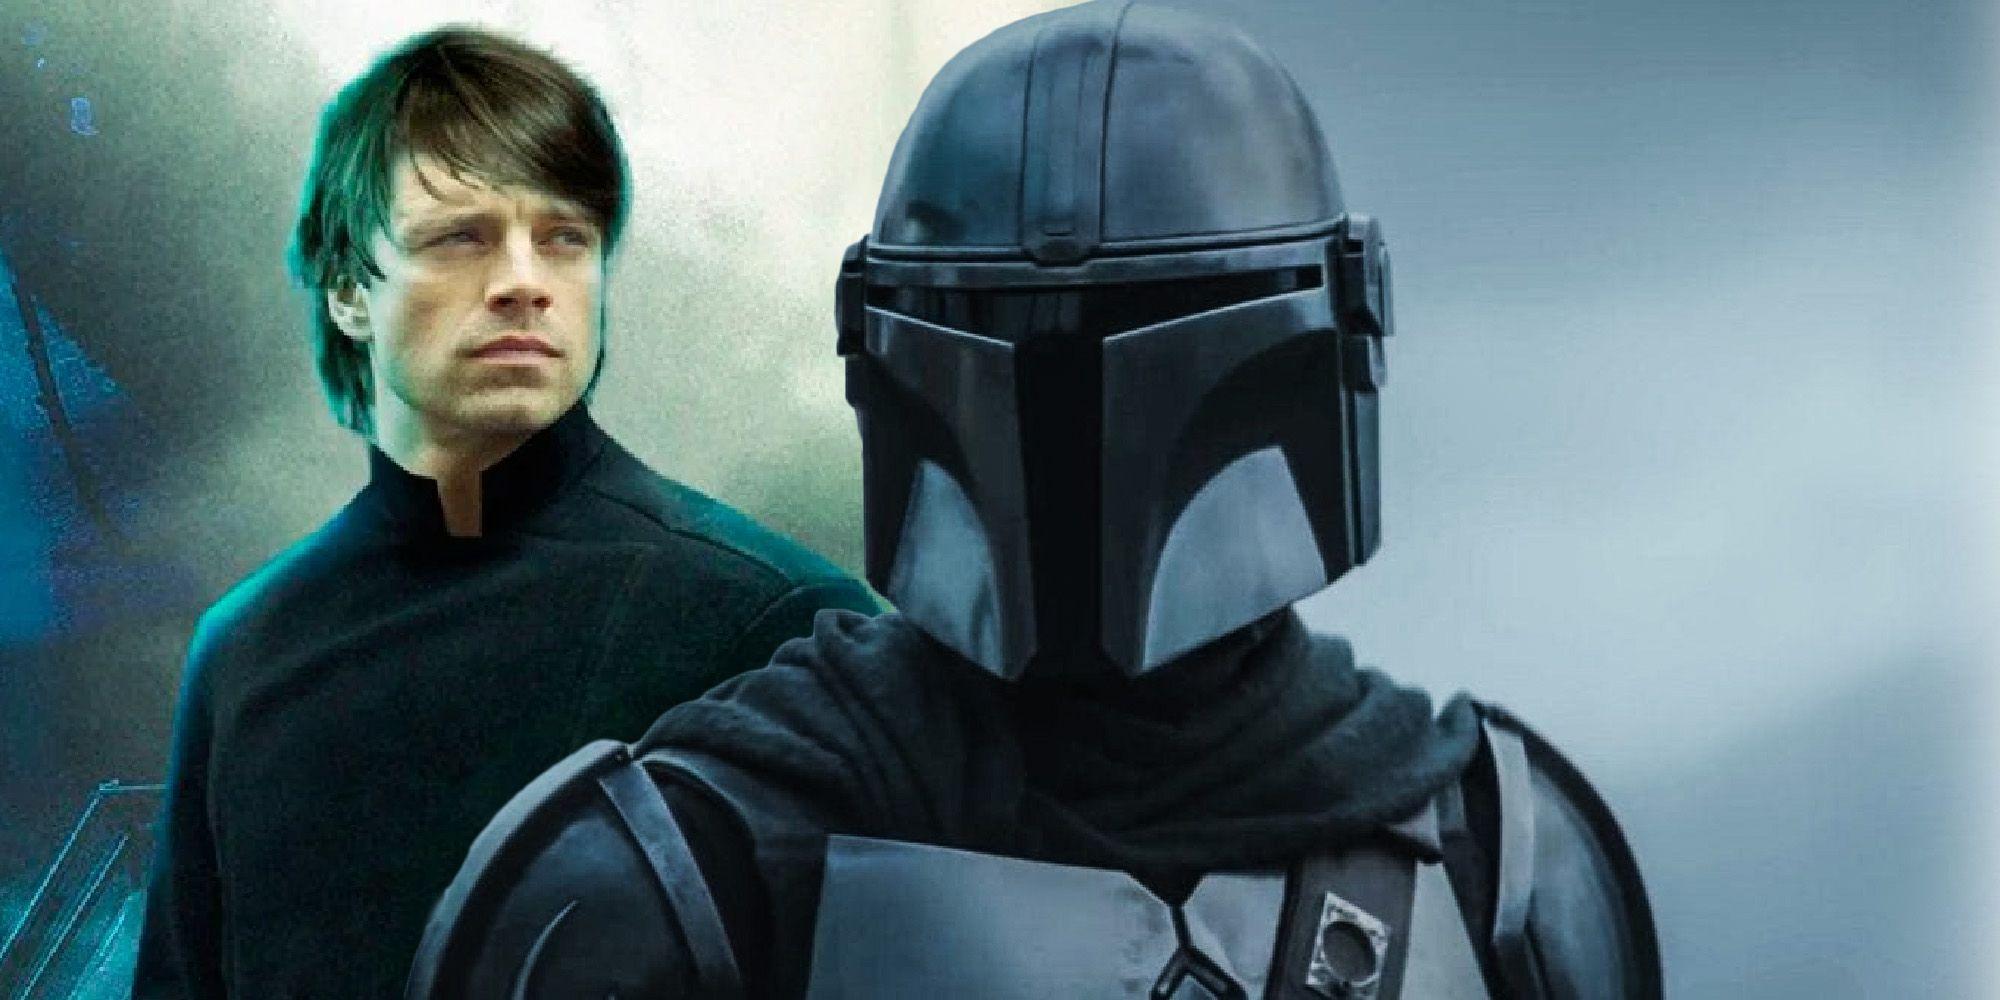 The Mandalorian Deepfake shows Sebastian Stan as Luke Skywalker